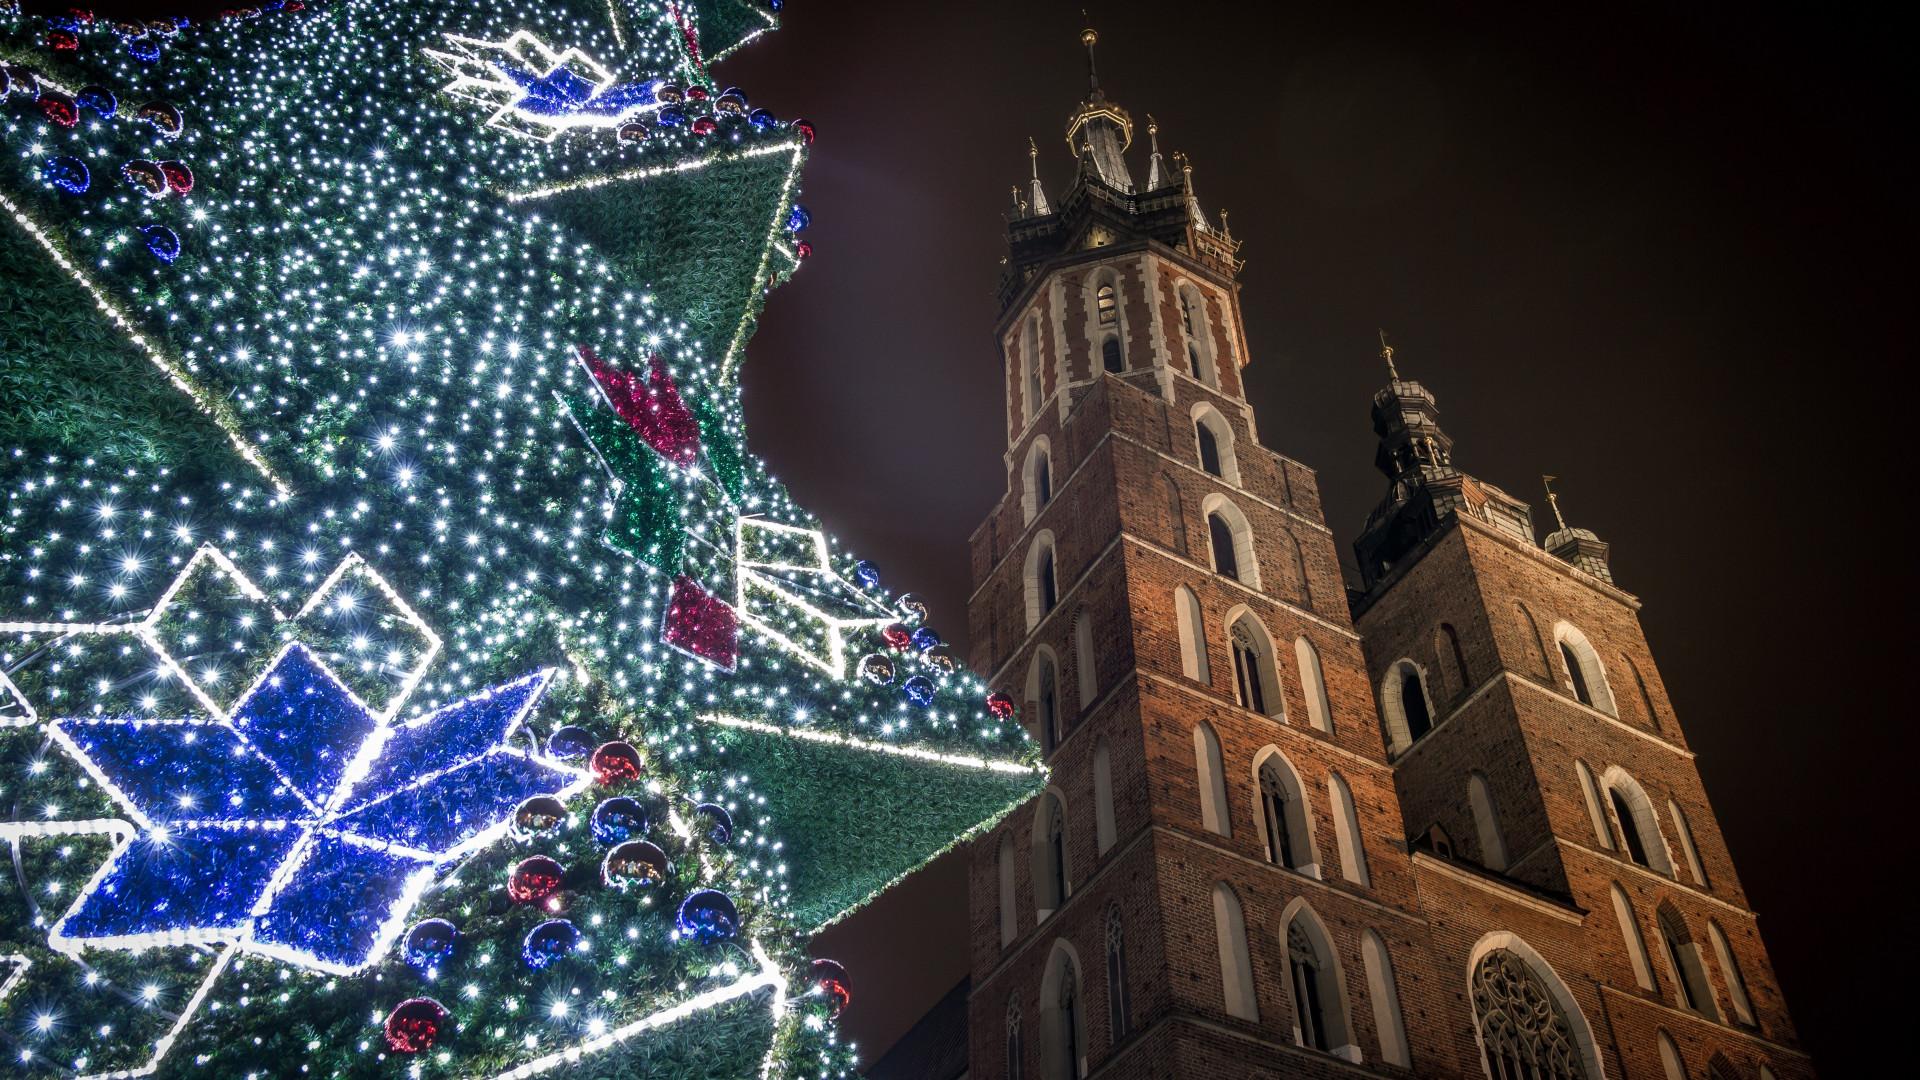 Krakow Christmas Market, Poland